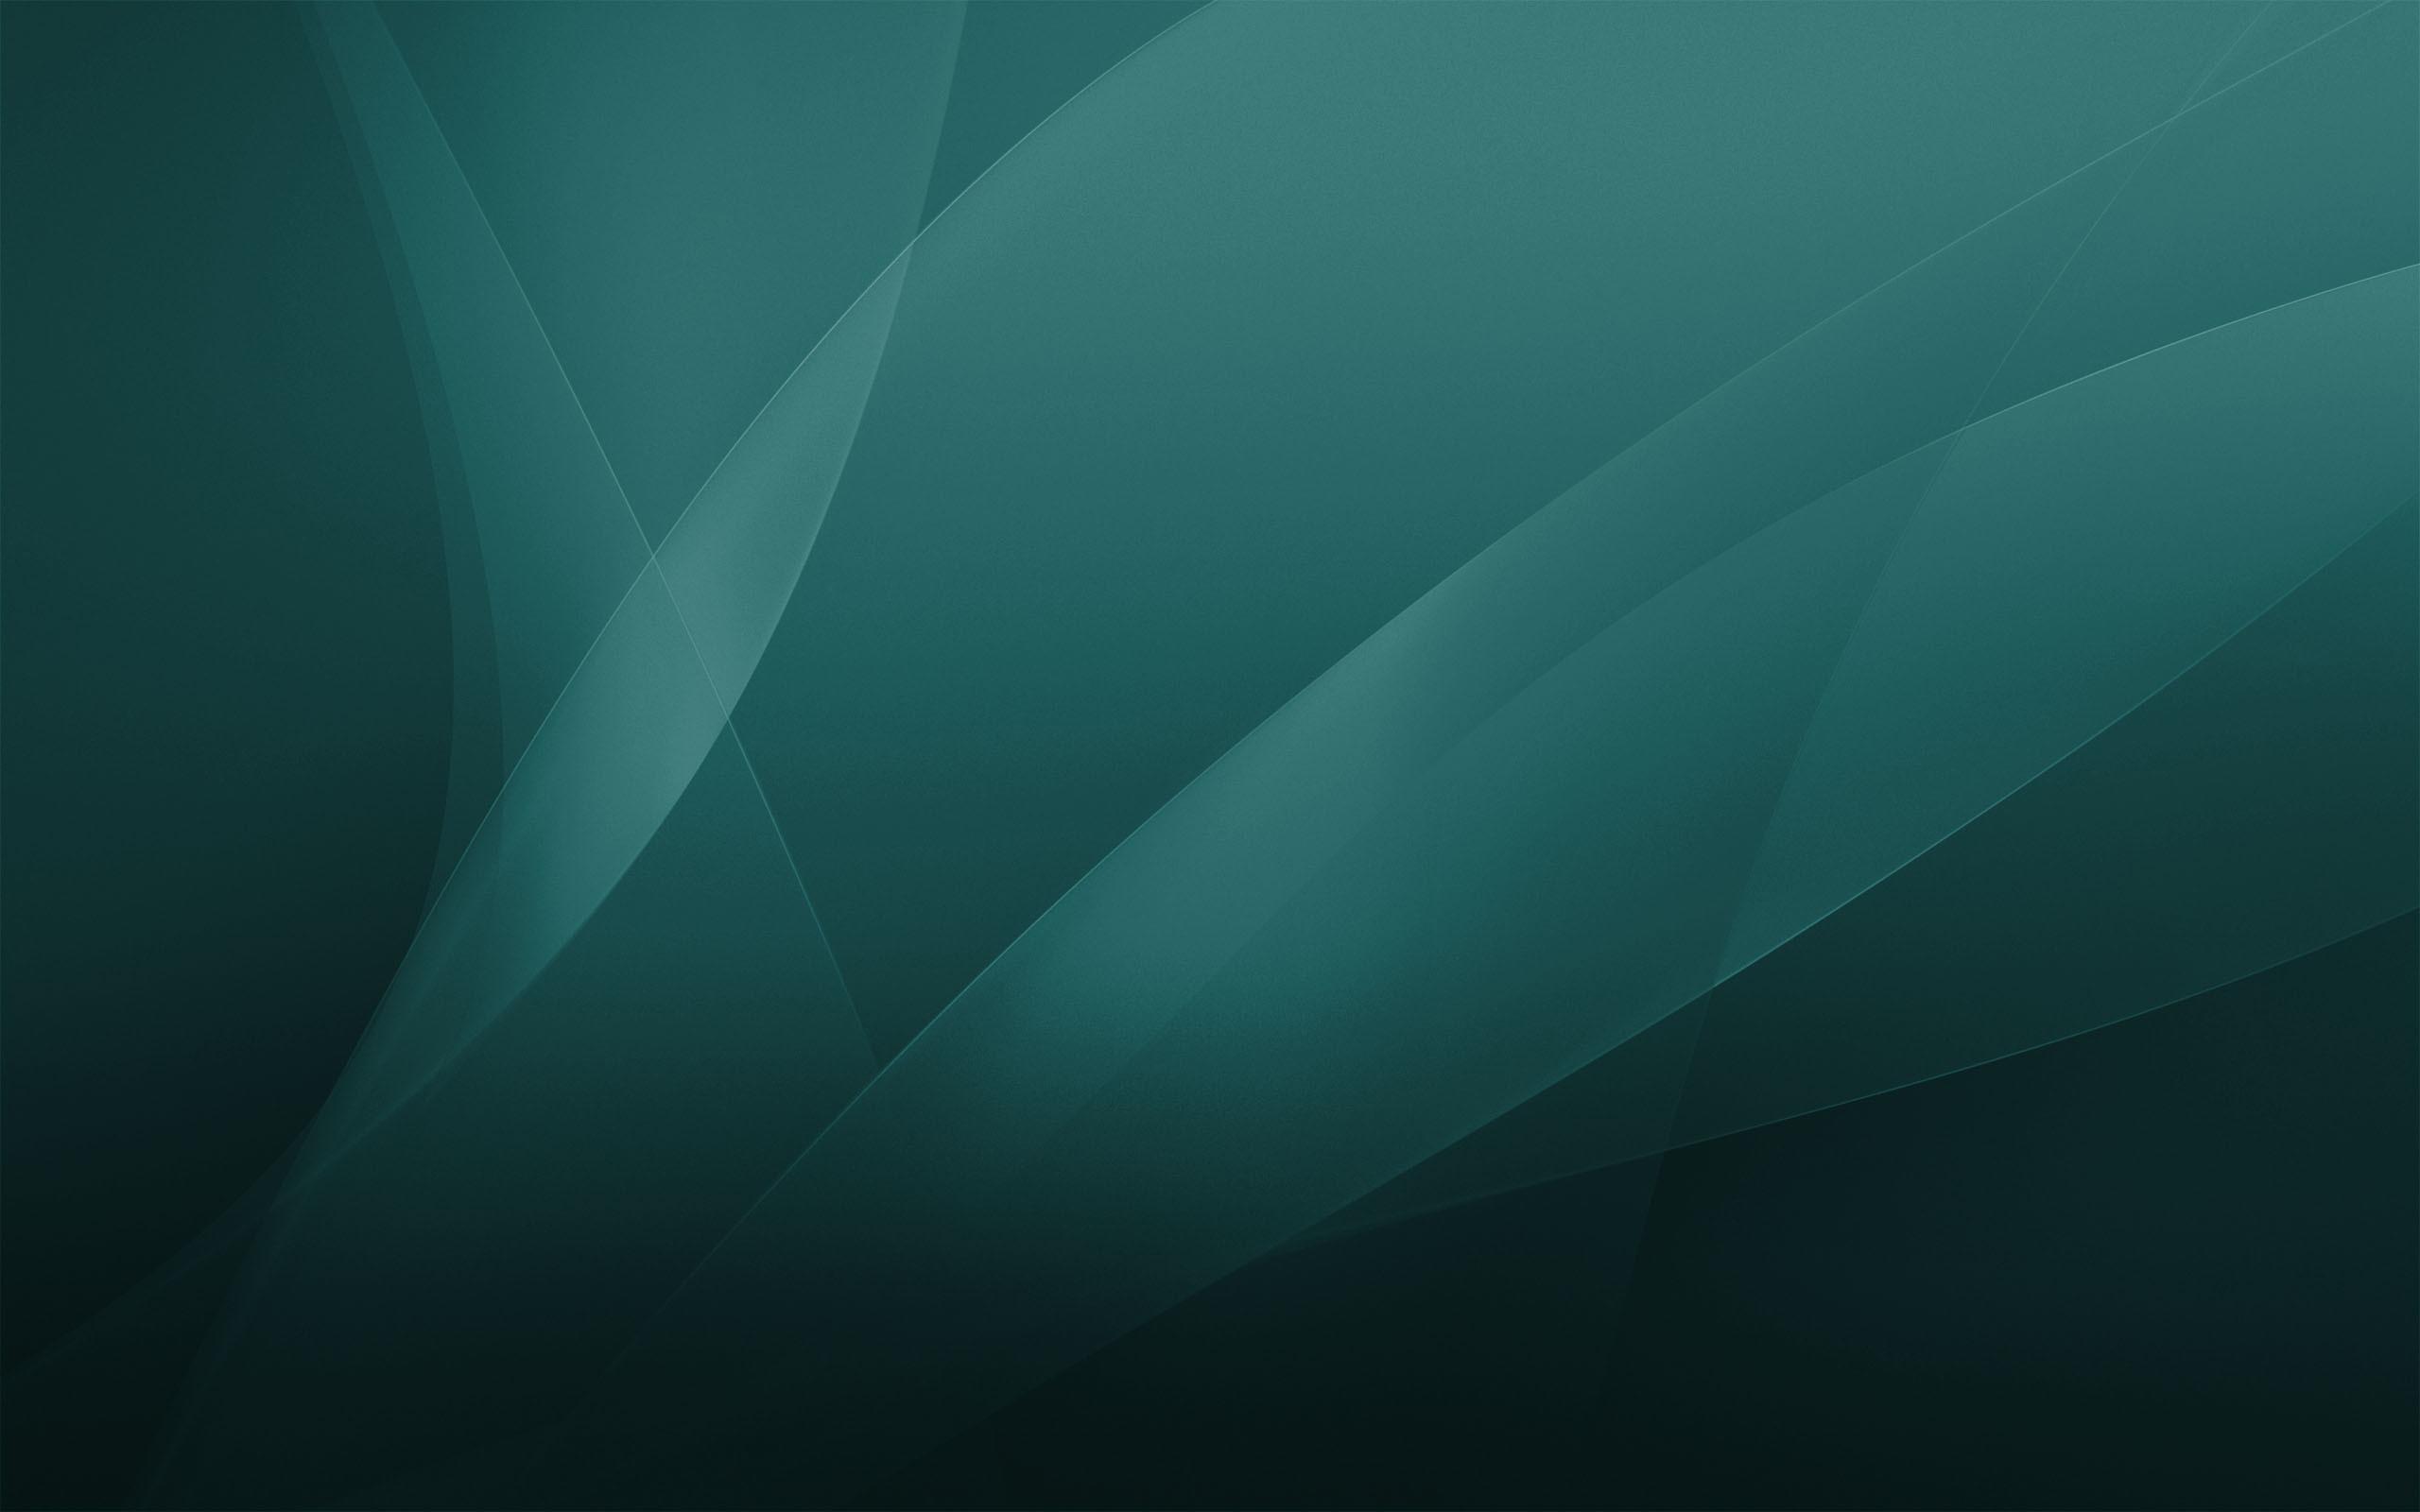 new aqua backgrounds